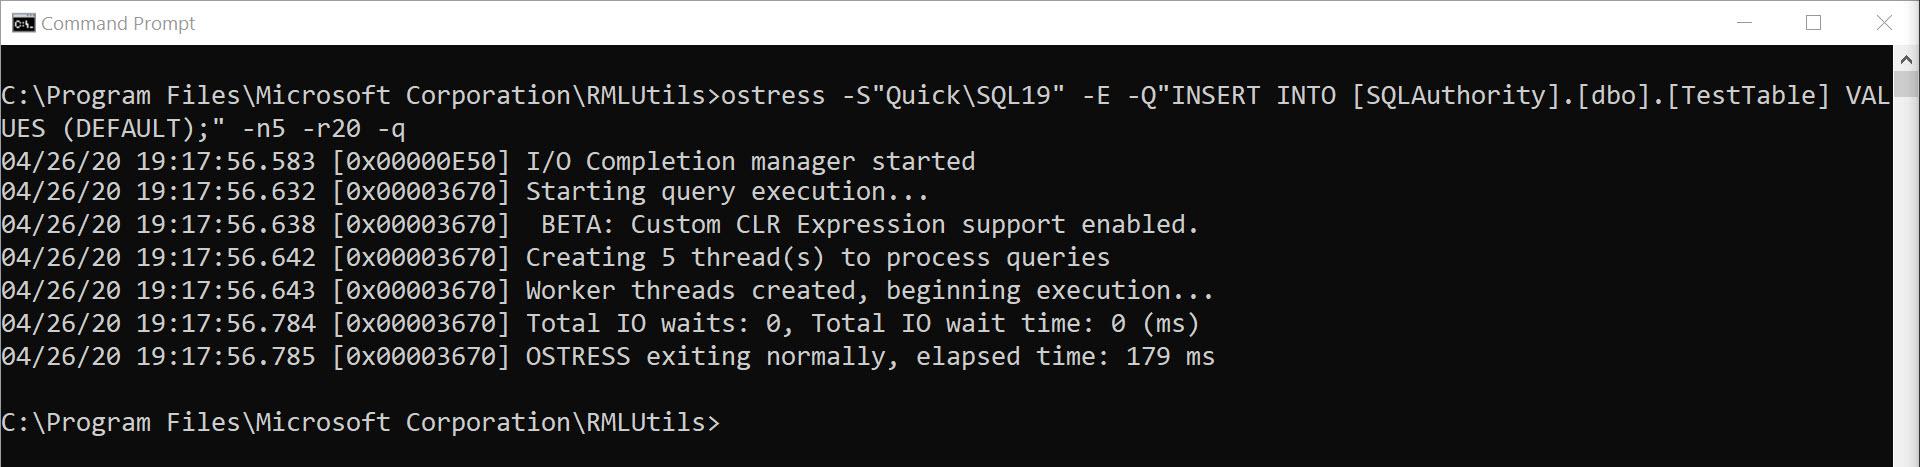 SQL SERVER - Stress Testing with oStress - Load Testing rml9